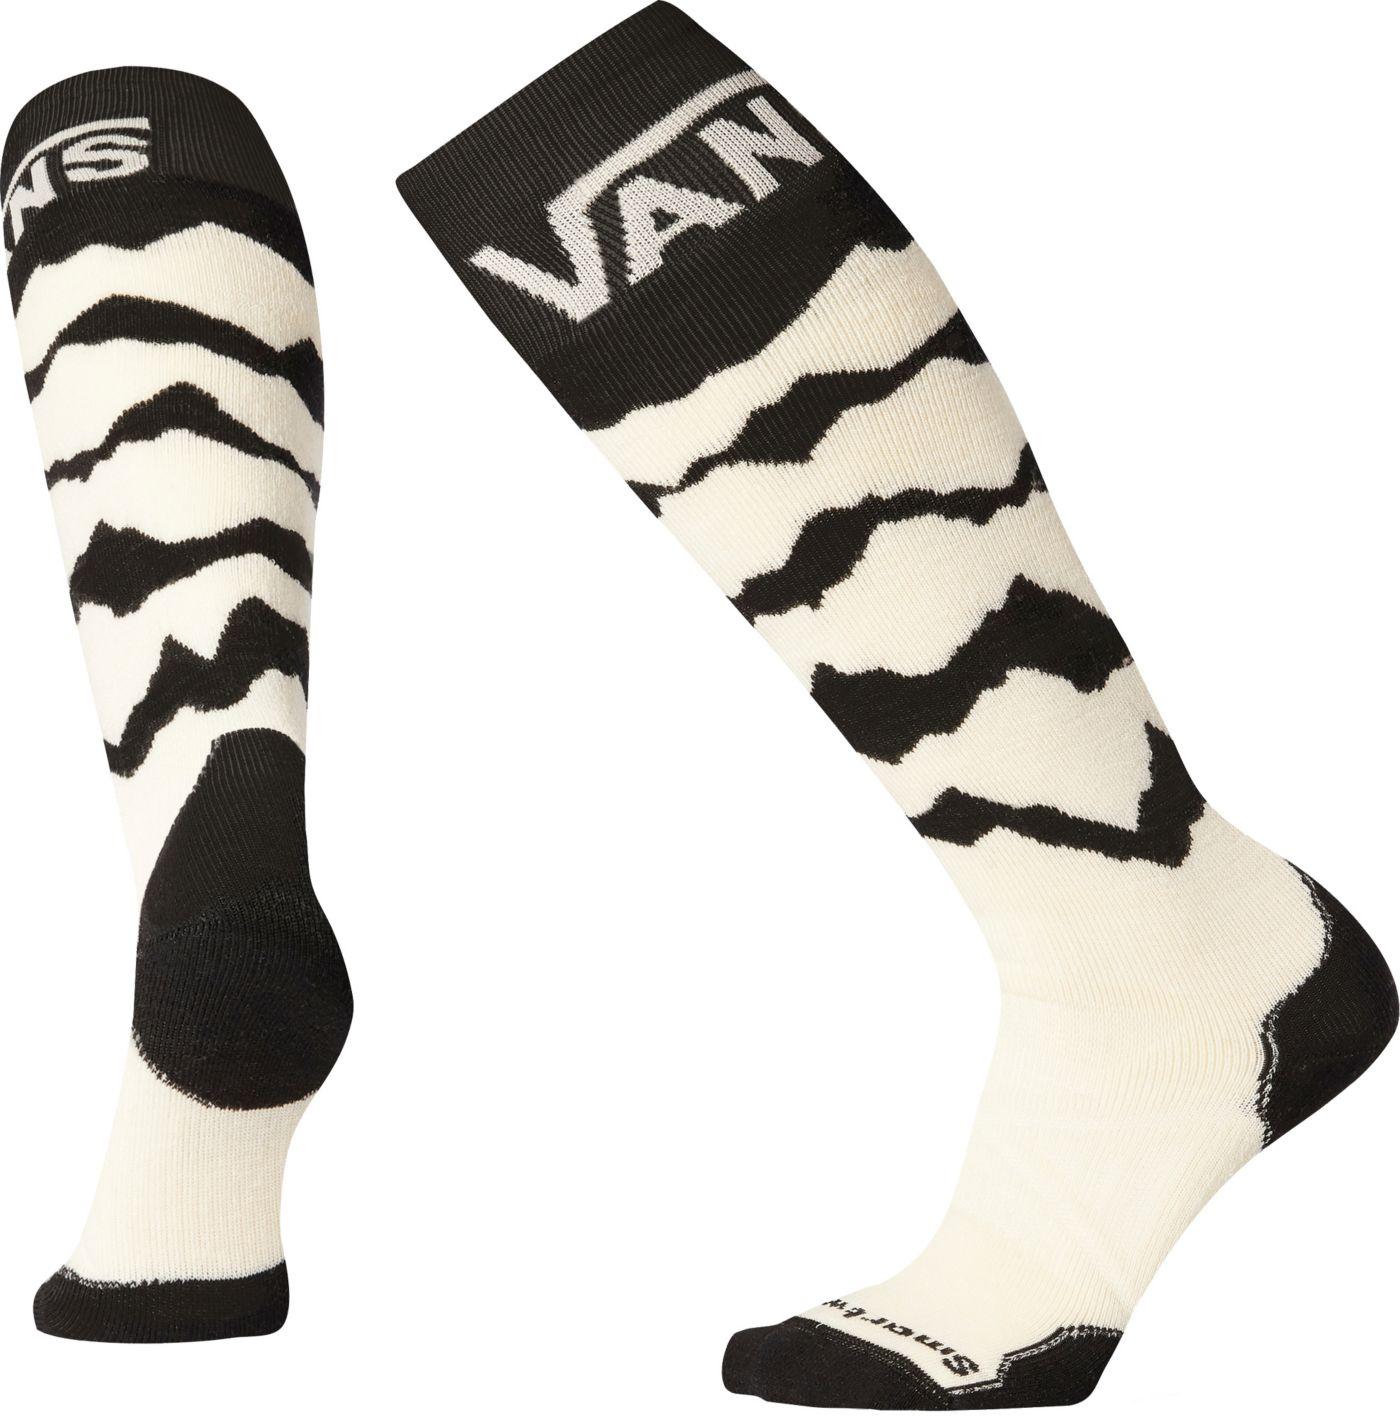 Smartwool Men's VANS Woodland Camp Print Socks